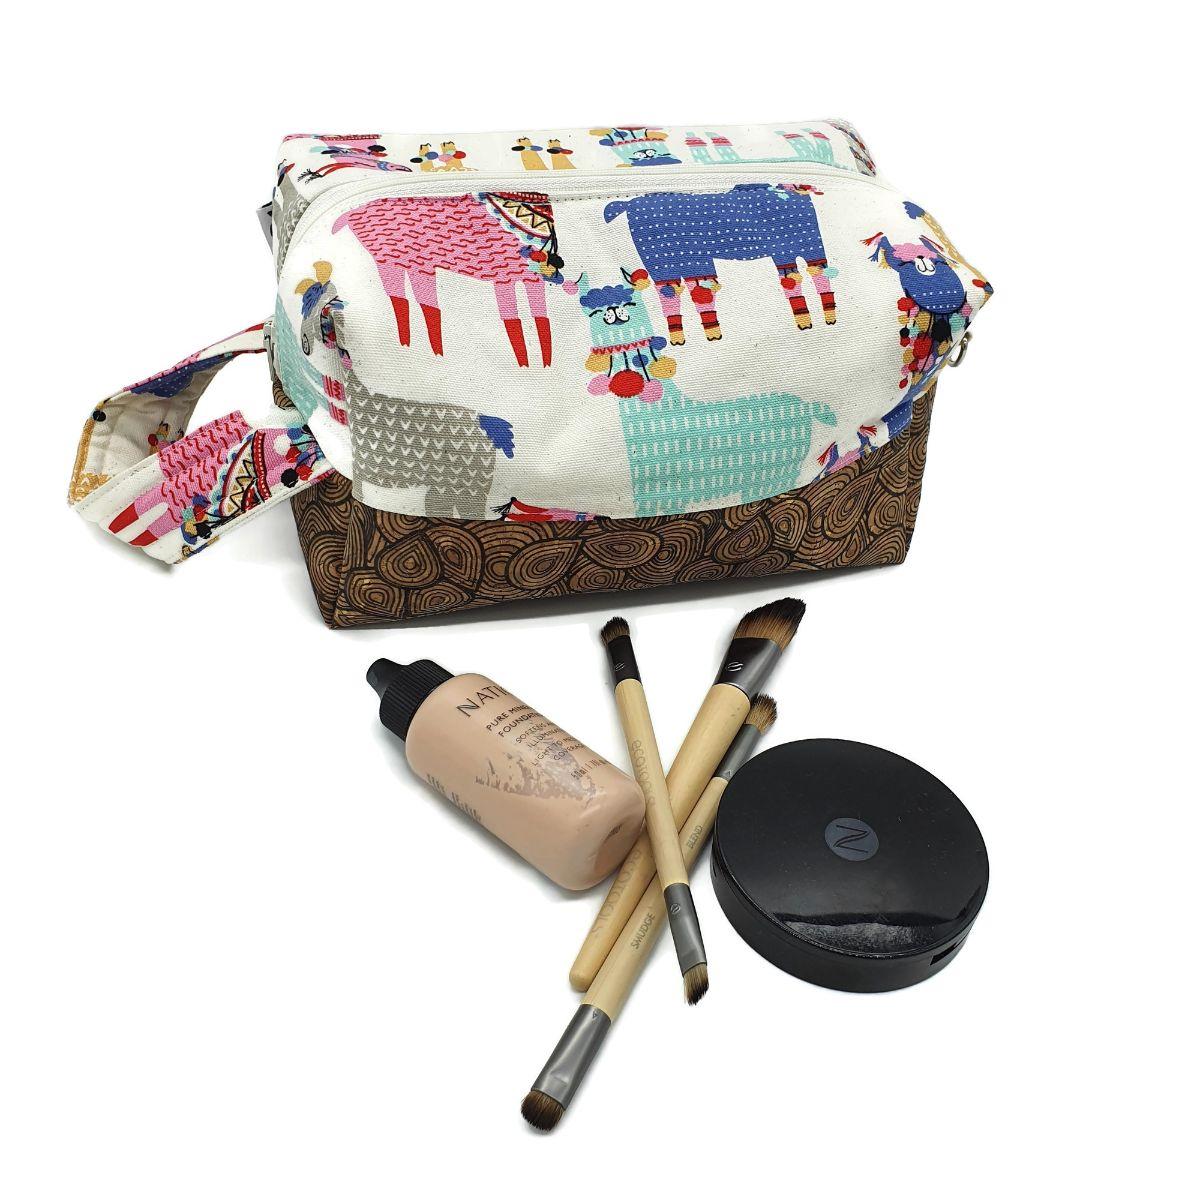 Llama Makeup Bag